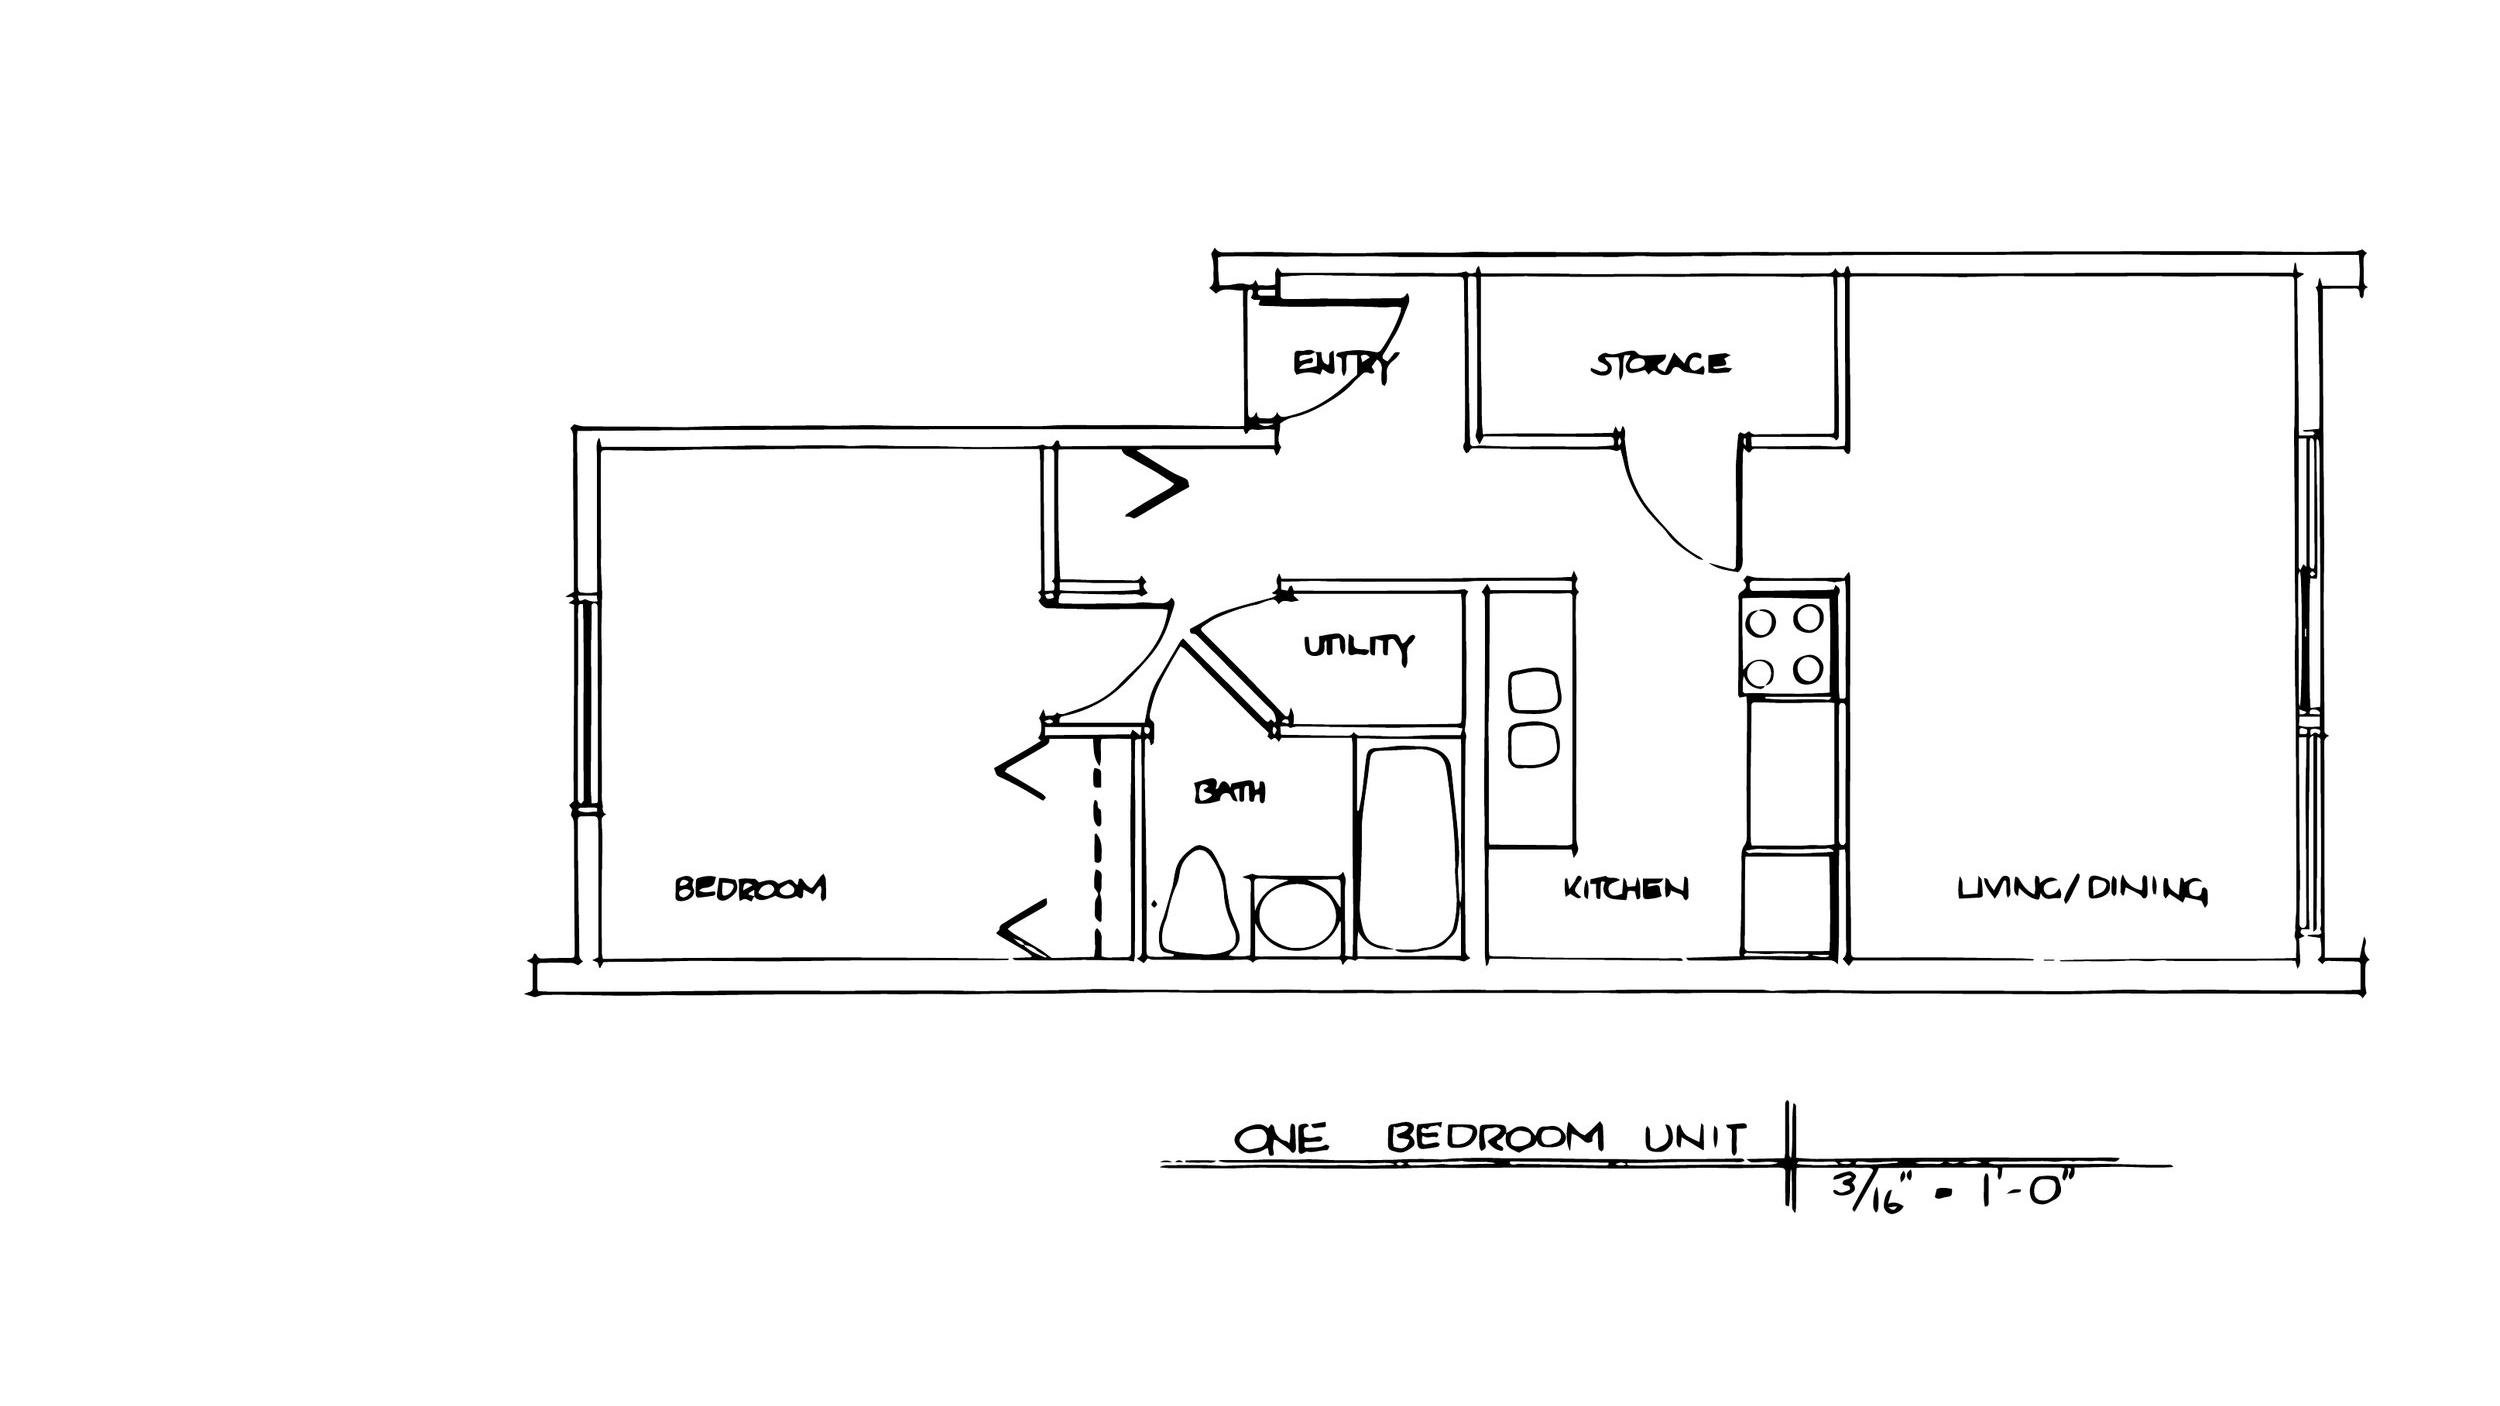 1 Bedroom (edited).jpg